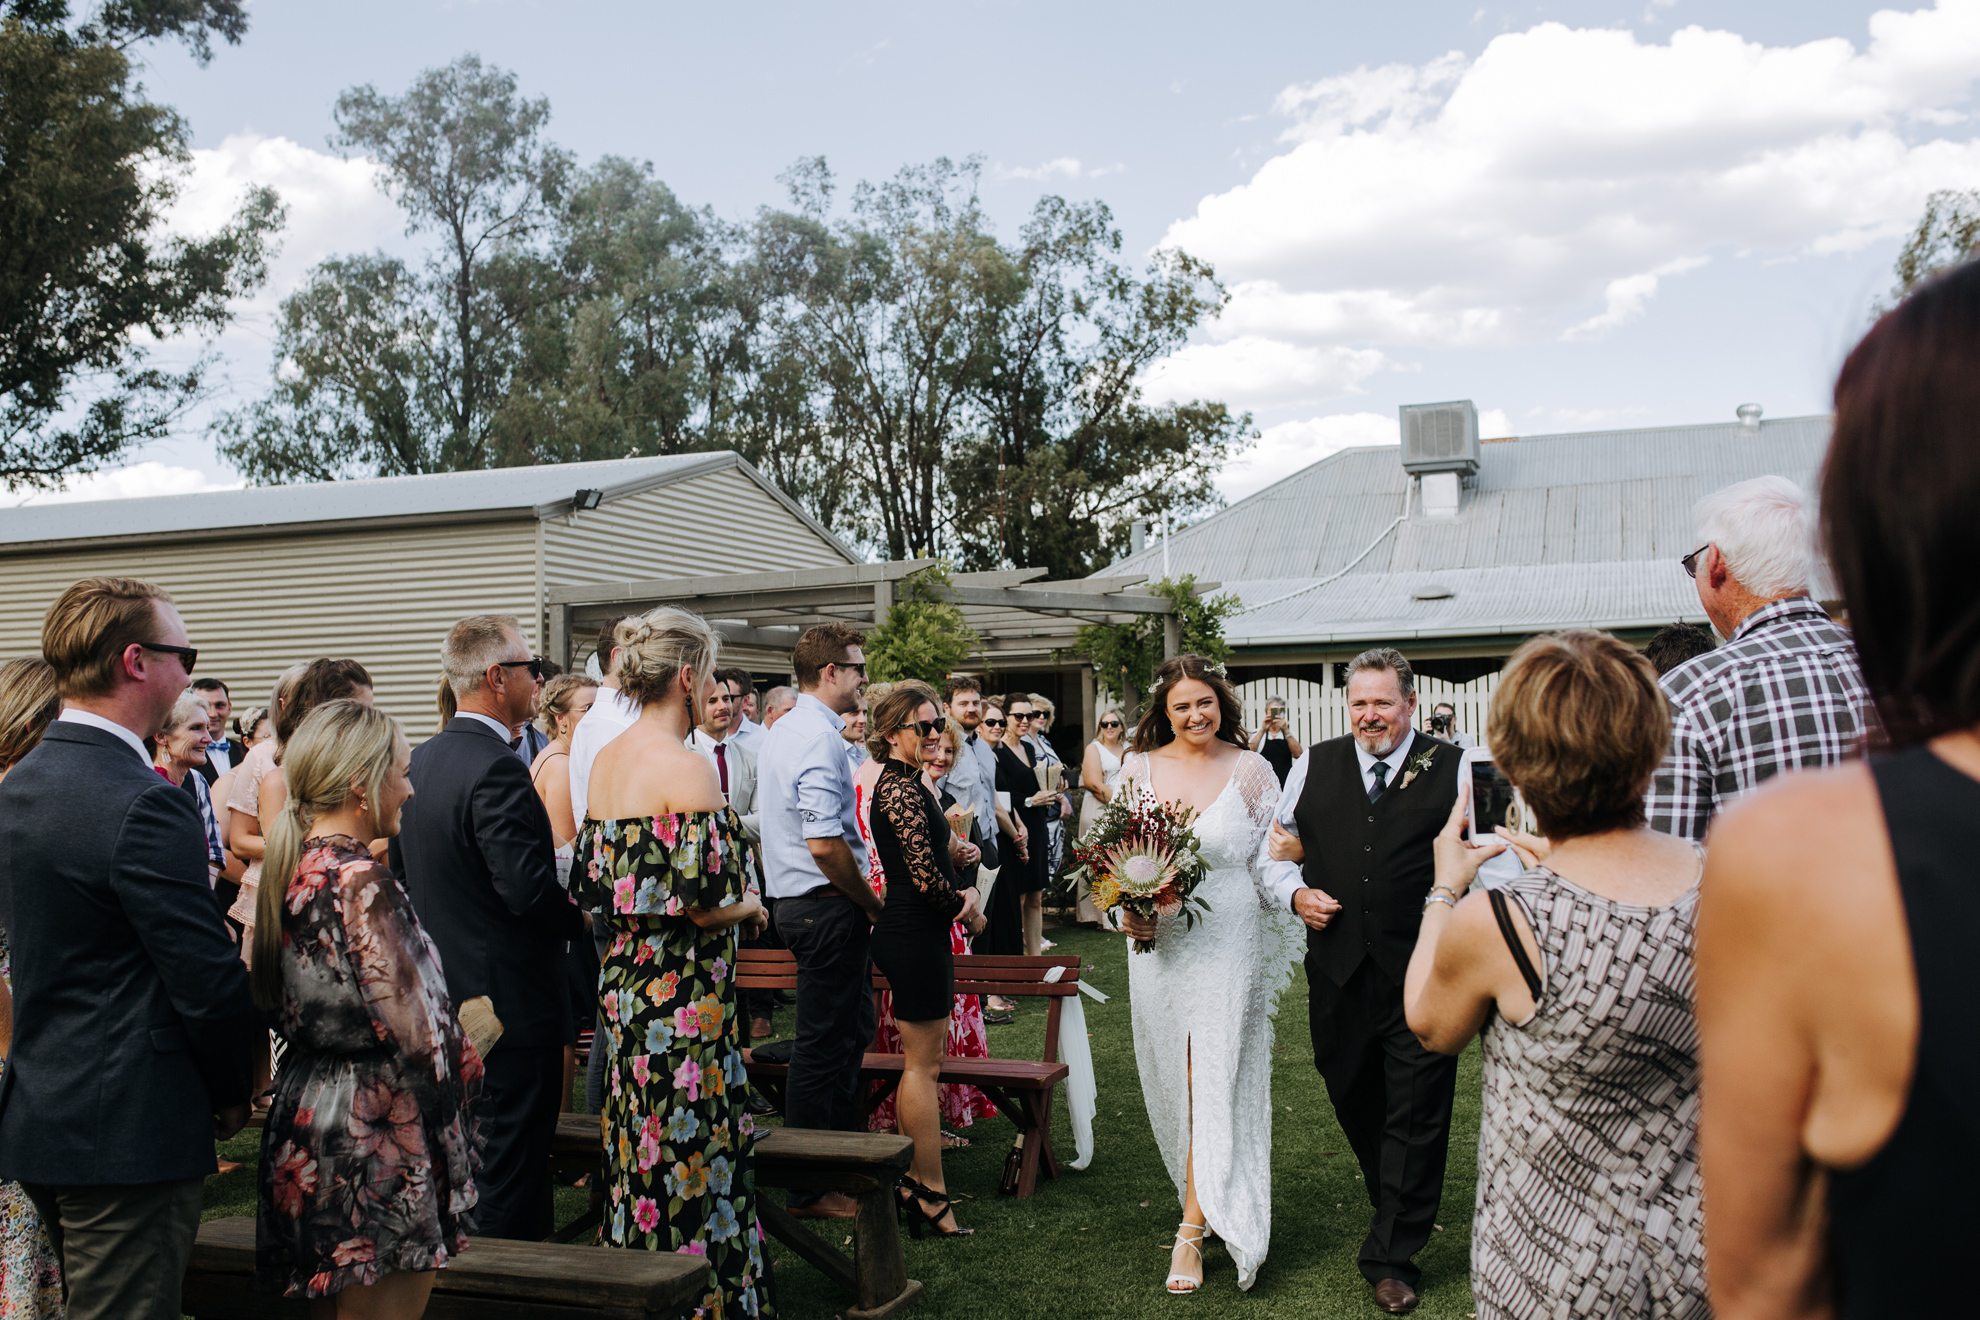 036-Jason_Jessie_Dalby_Country_Wedding.jpg